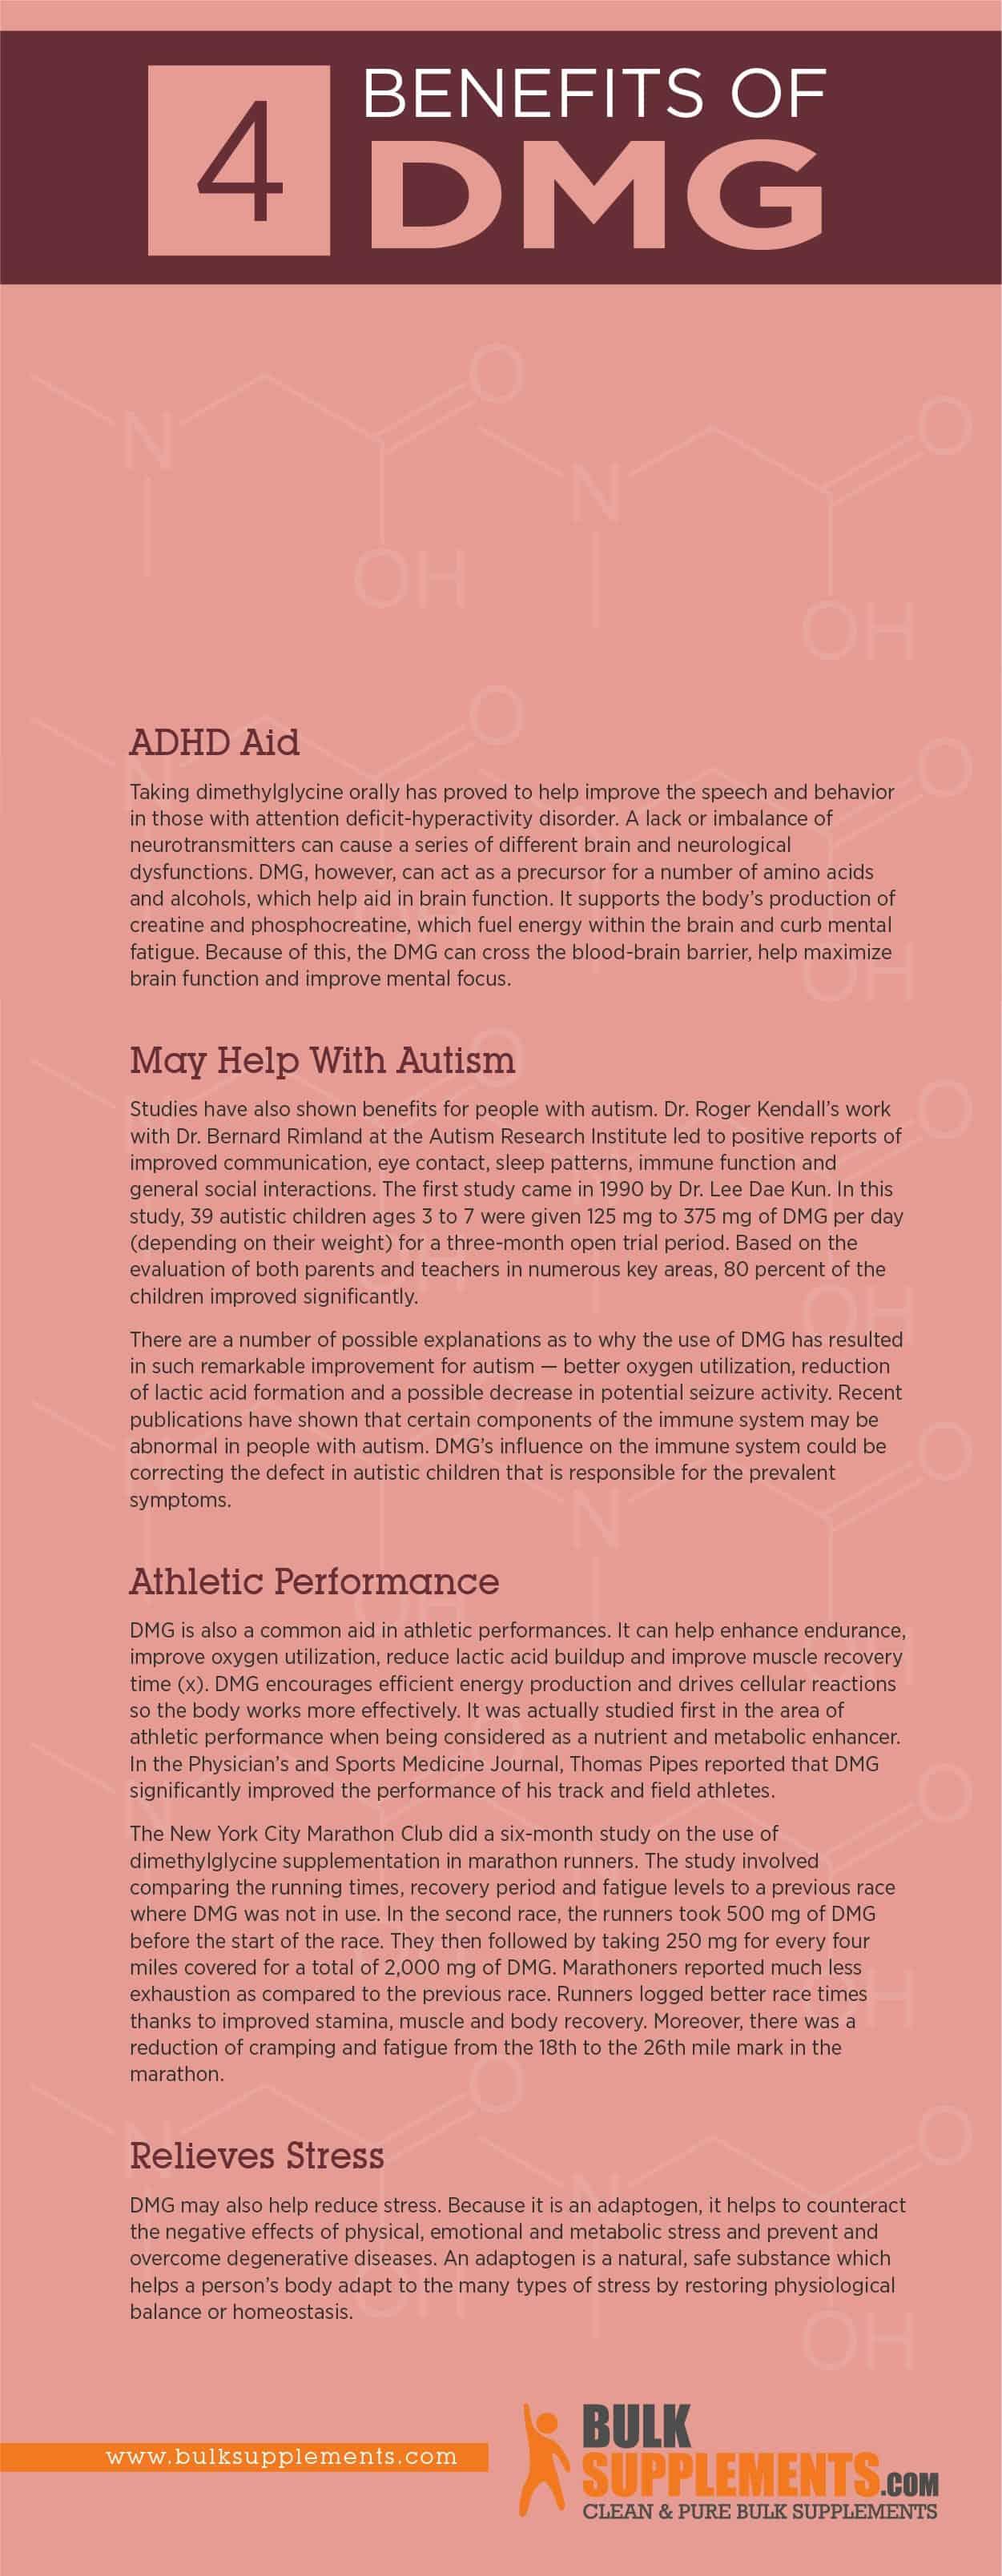 DMG Benefits